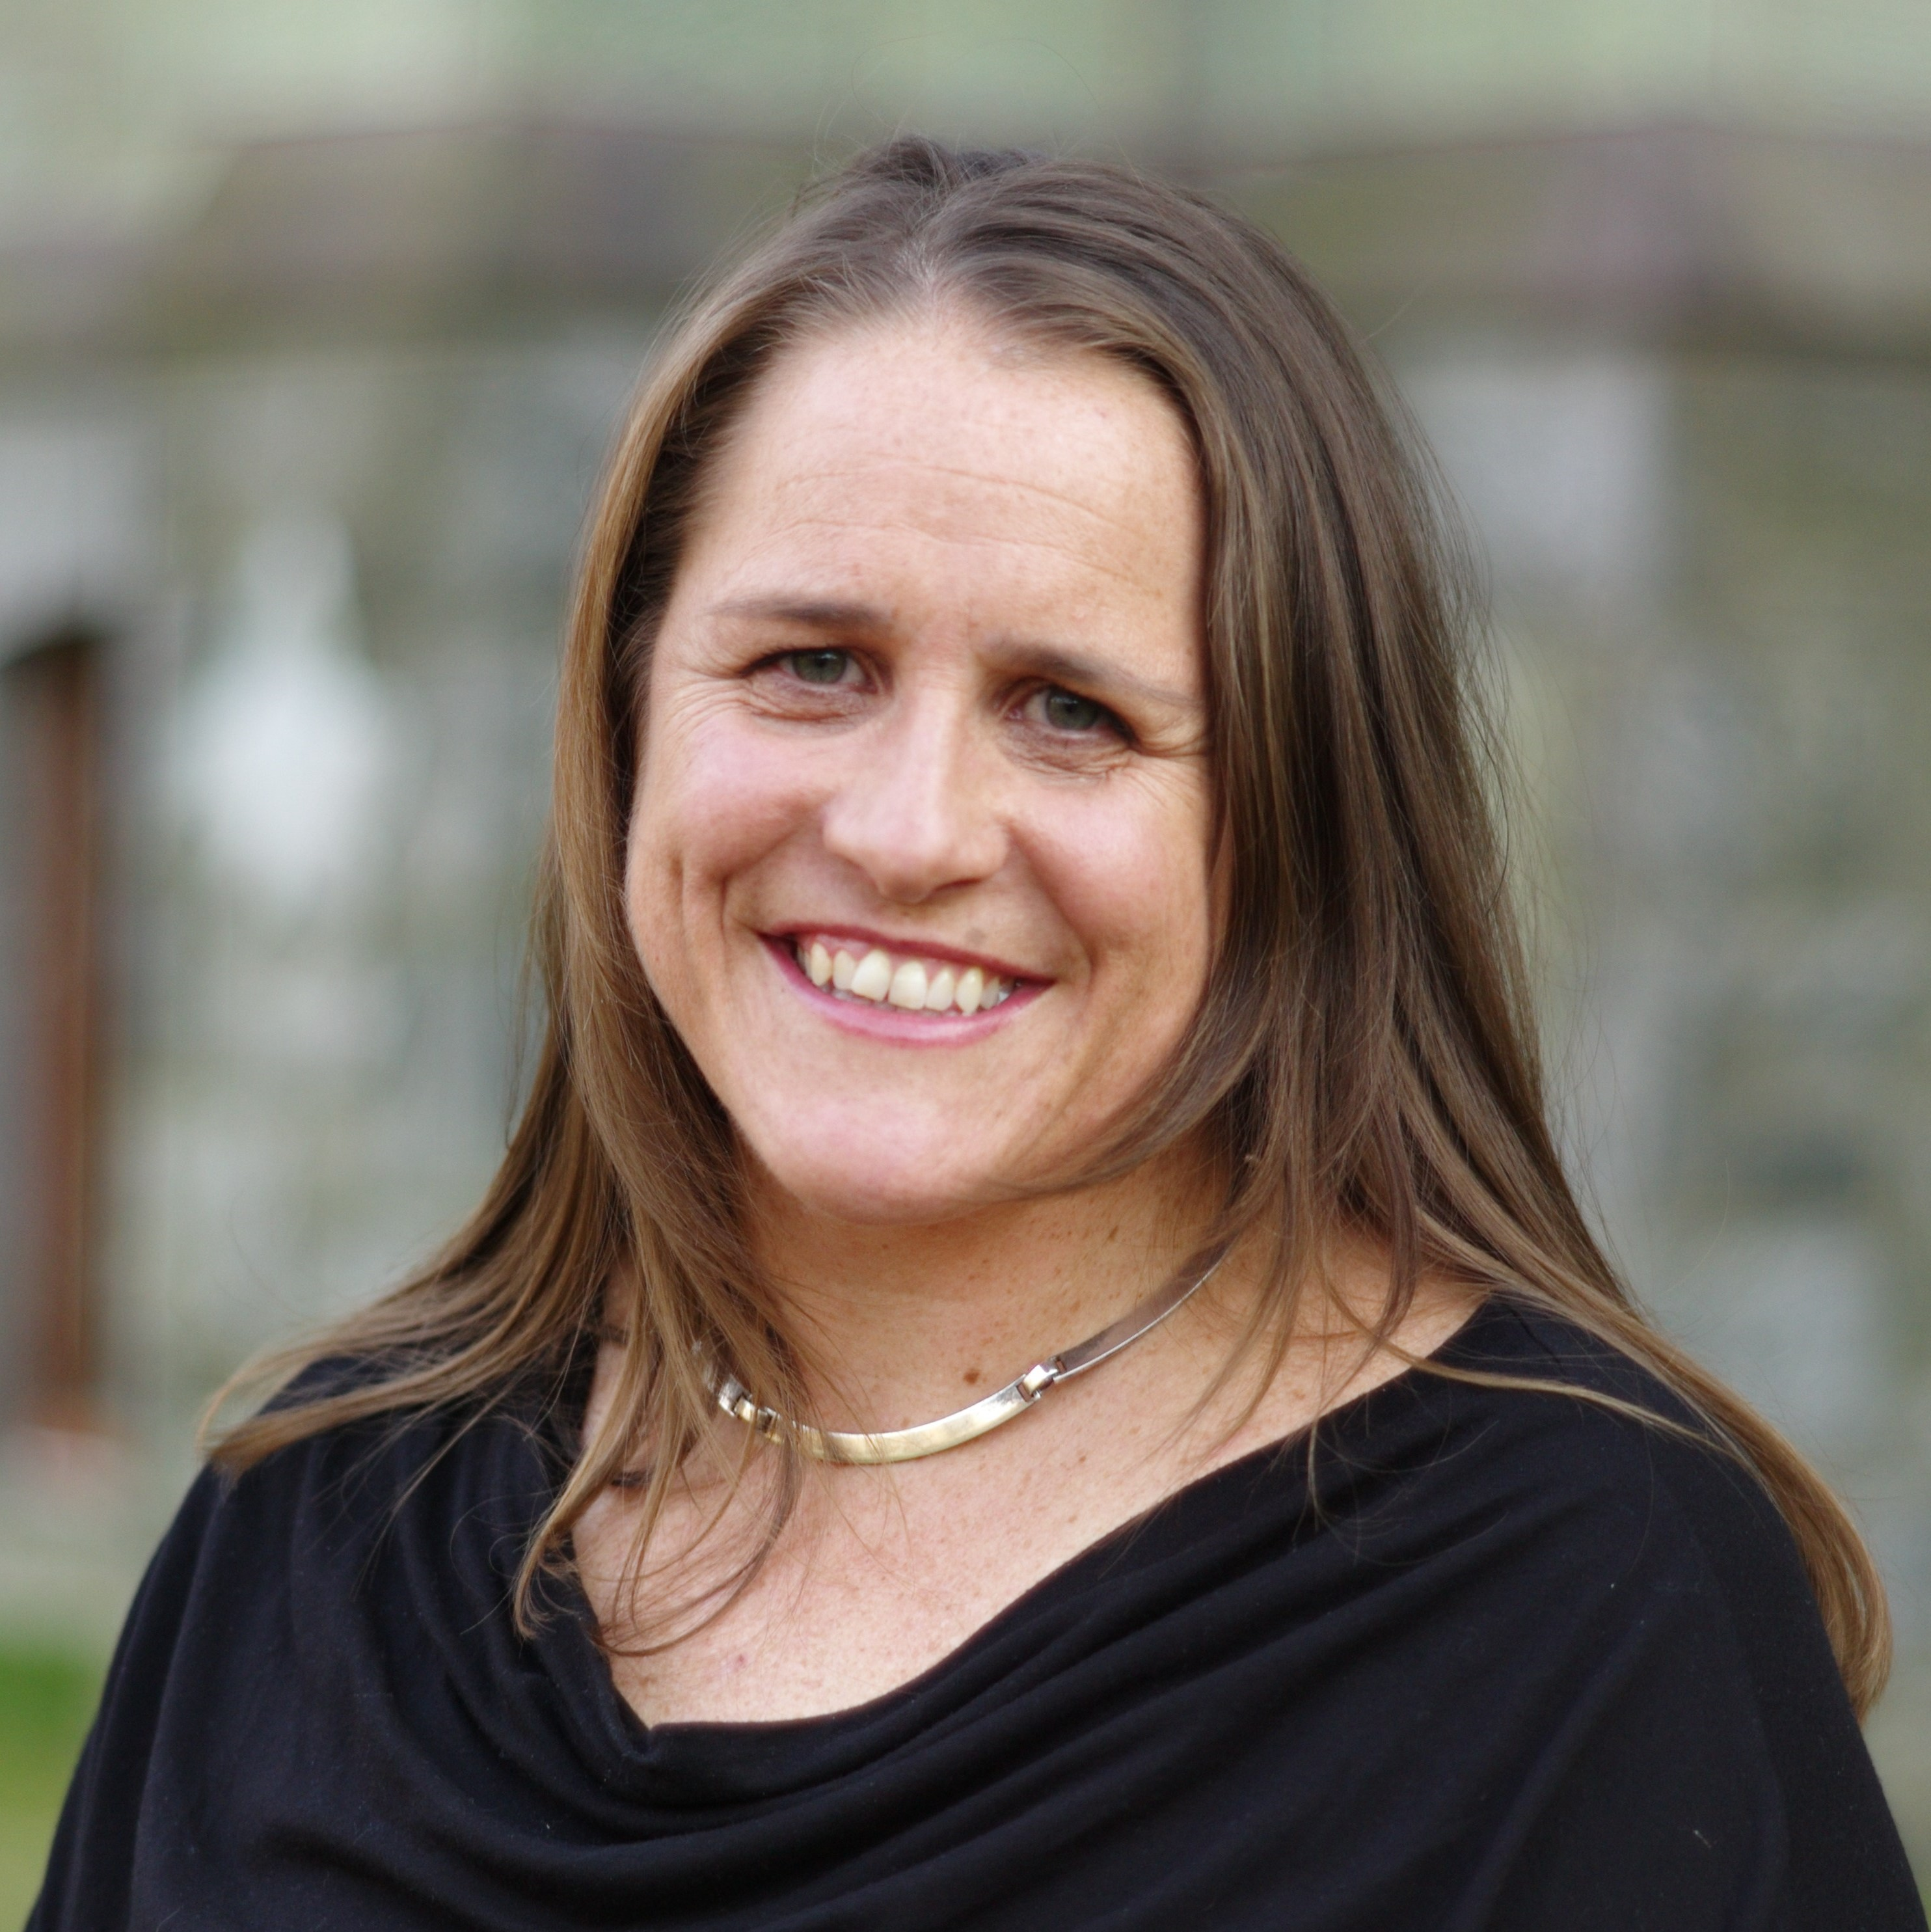 Claire Wardle